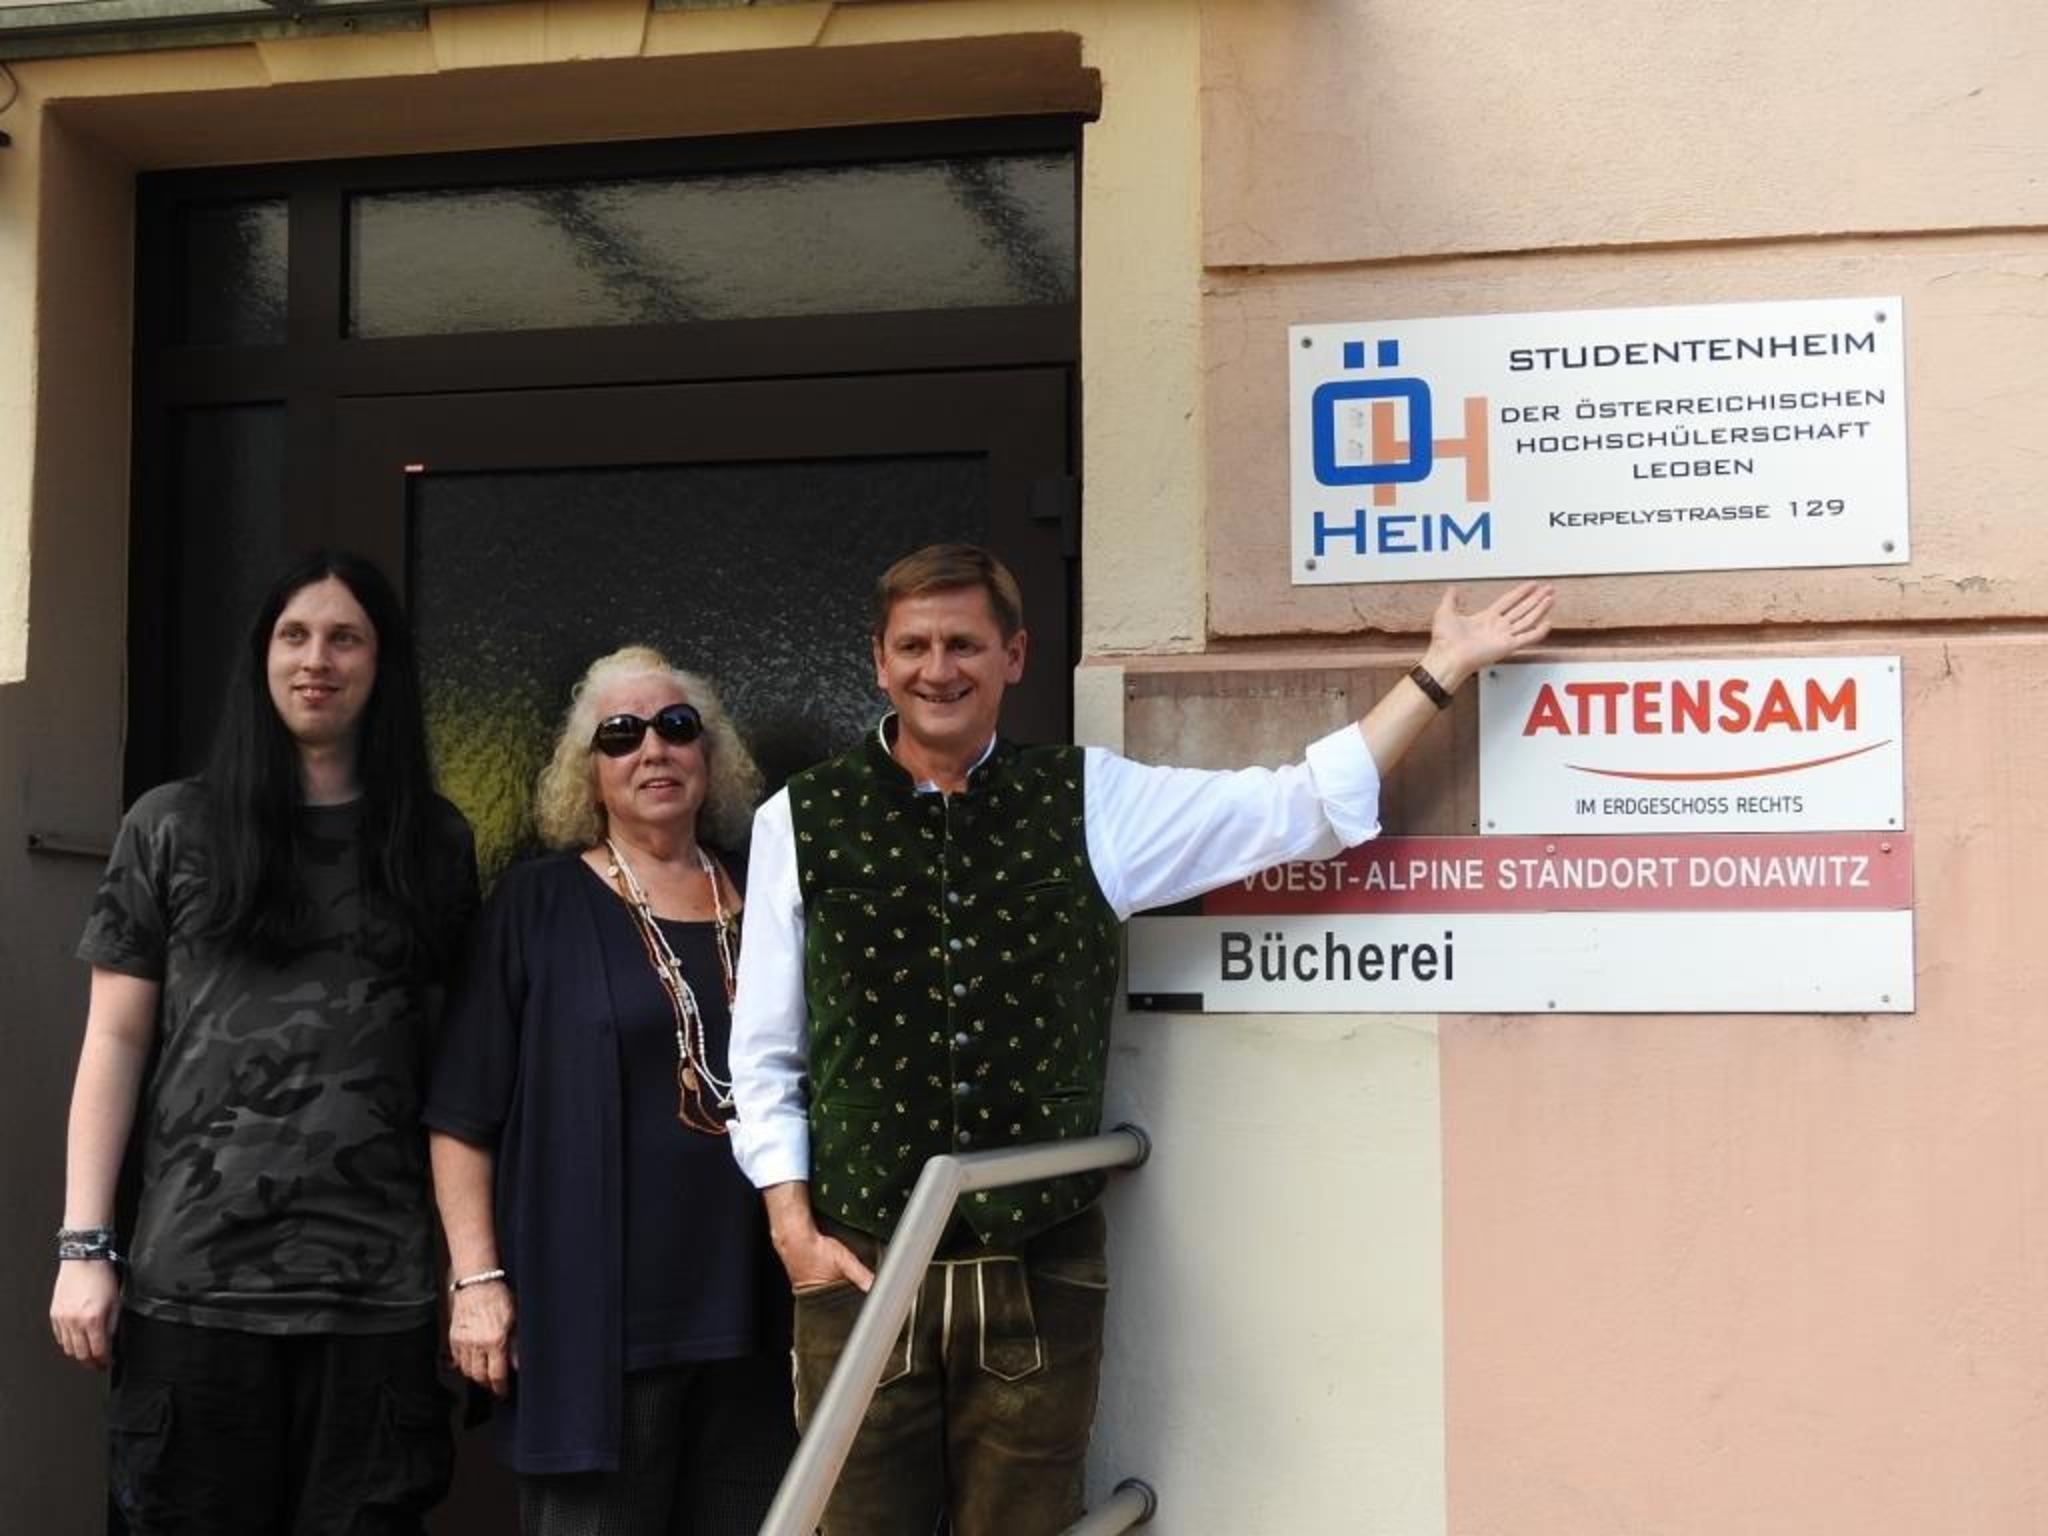 Donawitz in Steiermark - Thema auf carolinavolksfolks.com